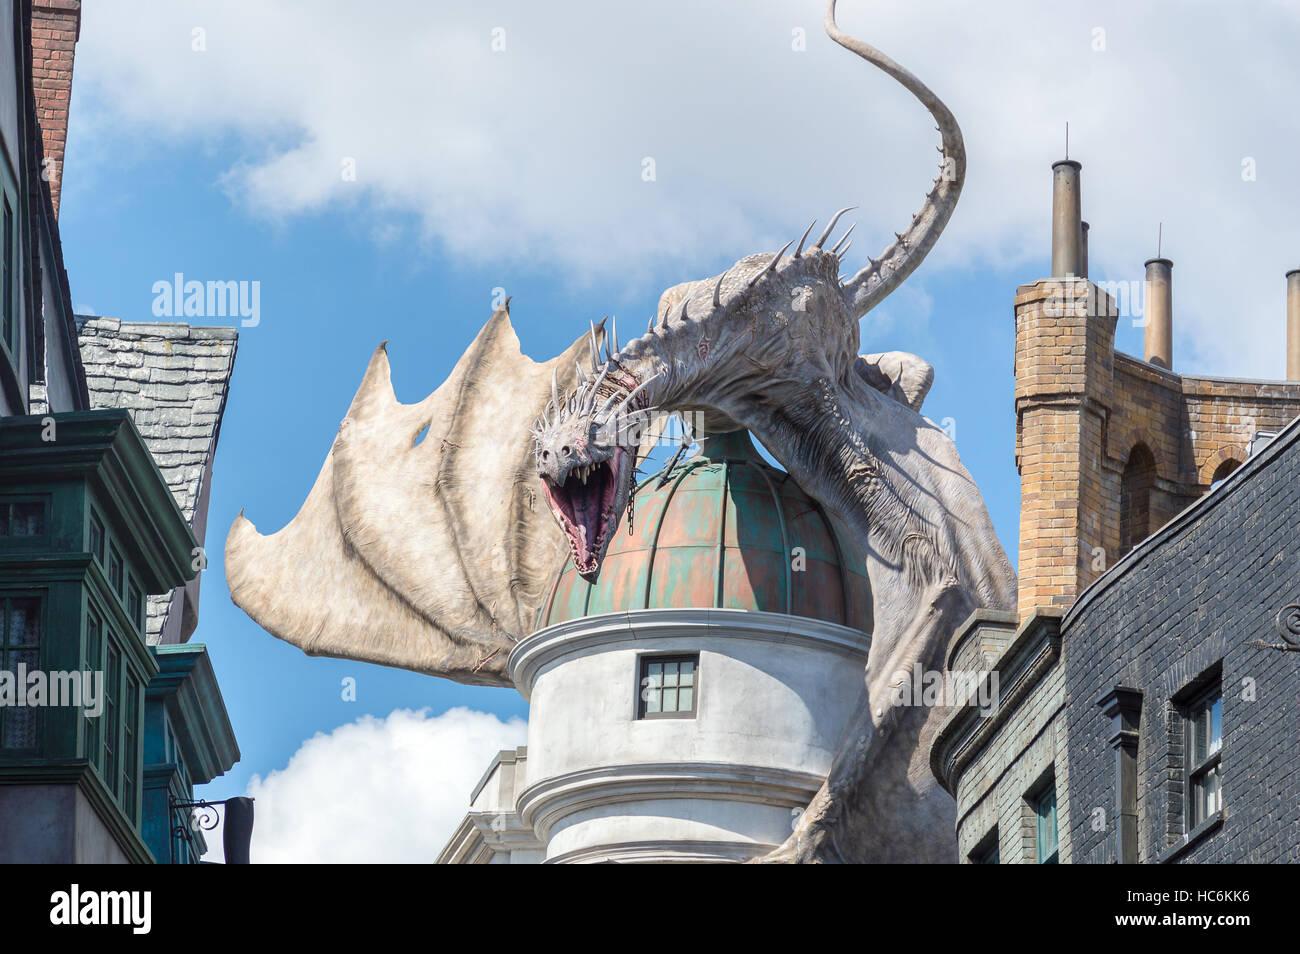 gringotts-bank-dragon-HC6KK6.jpg